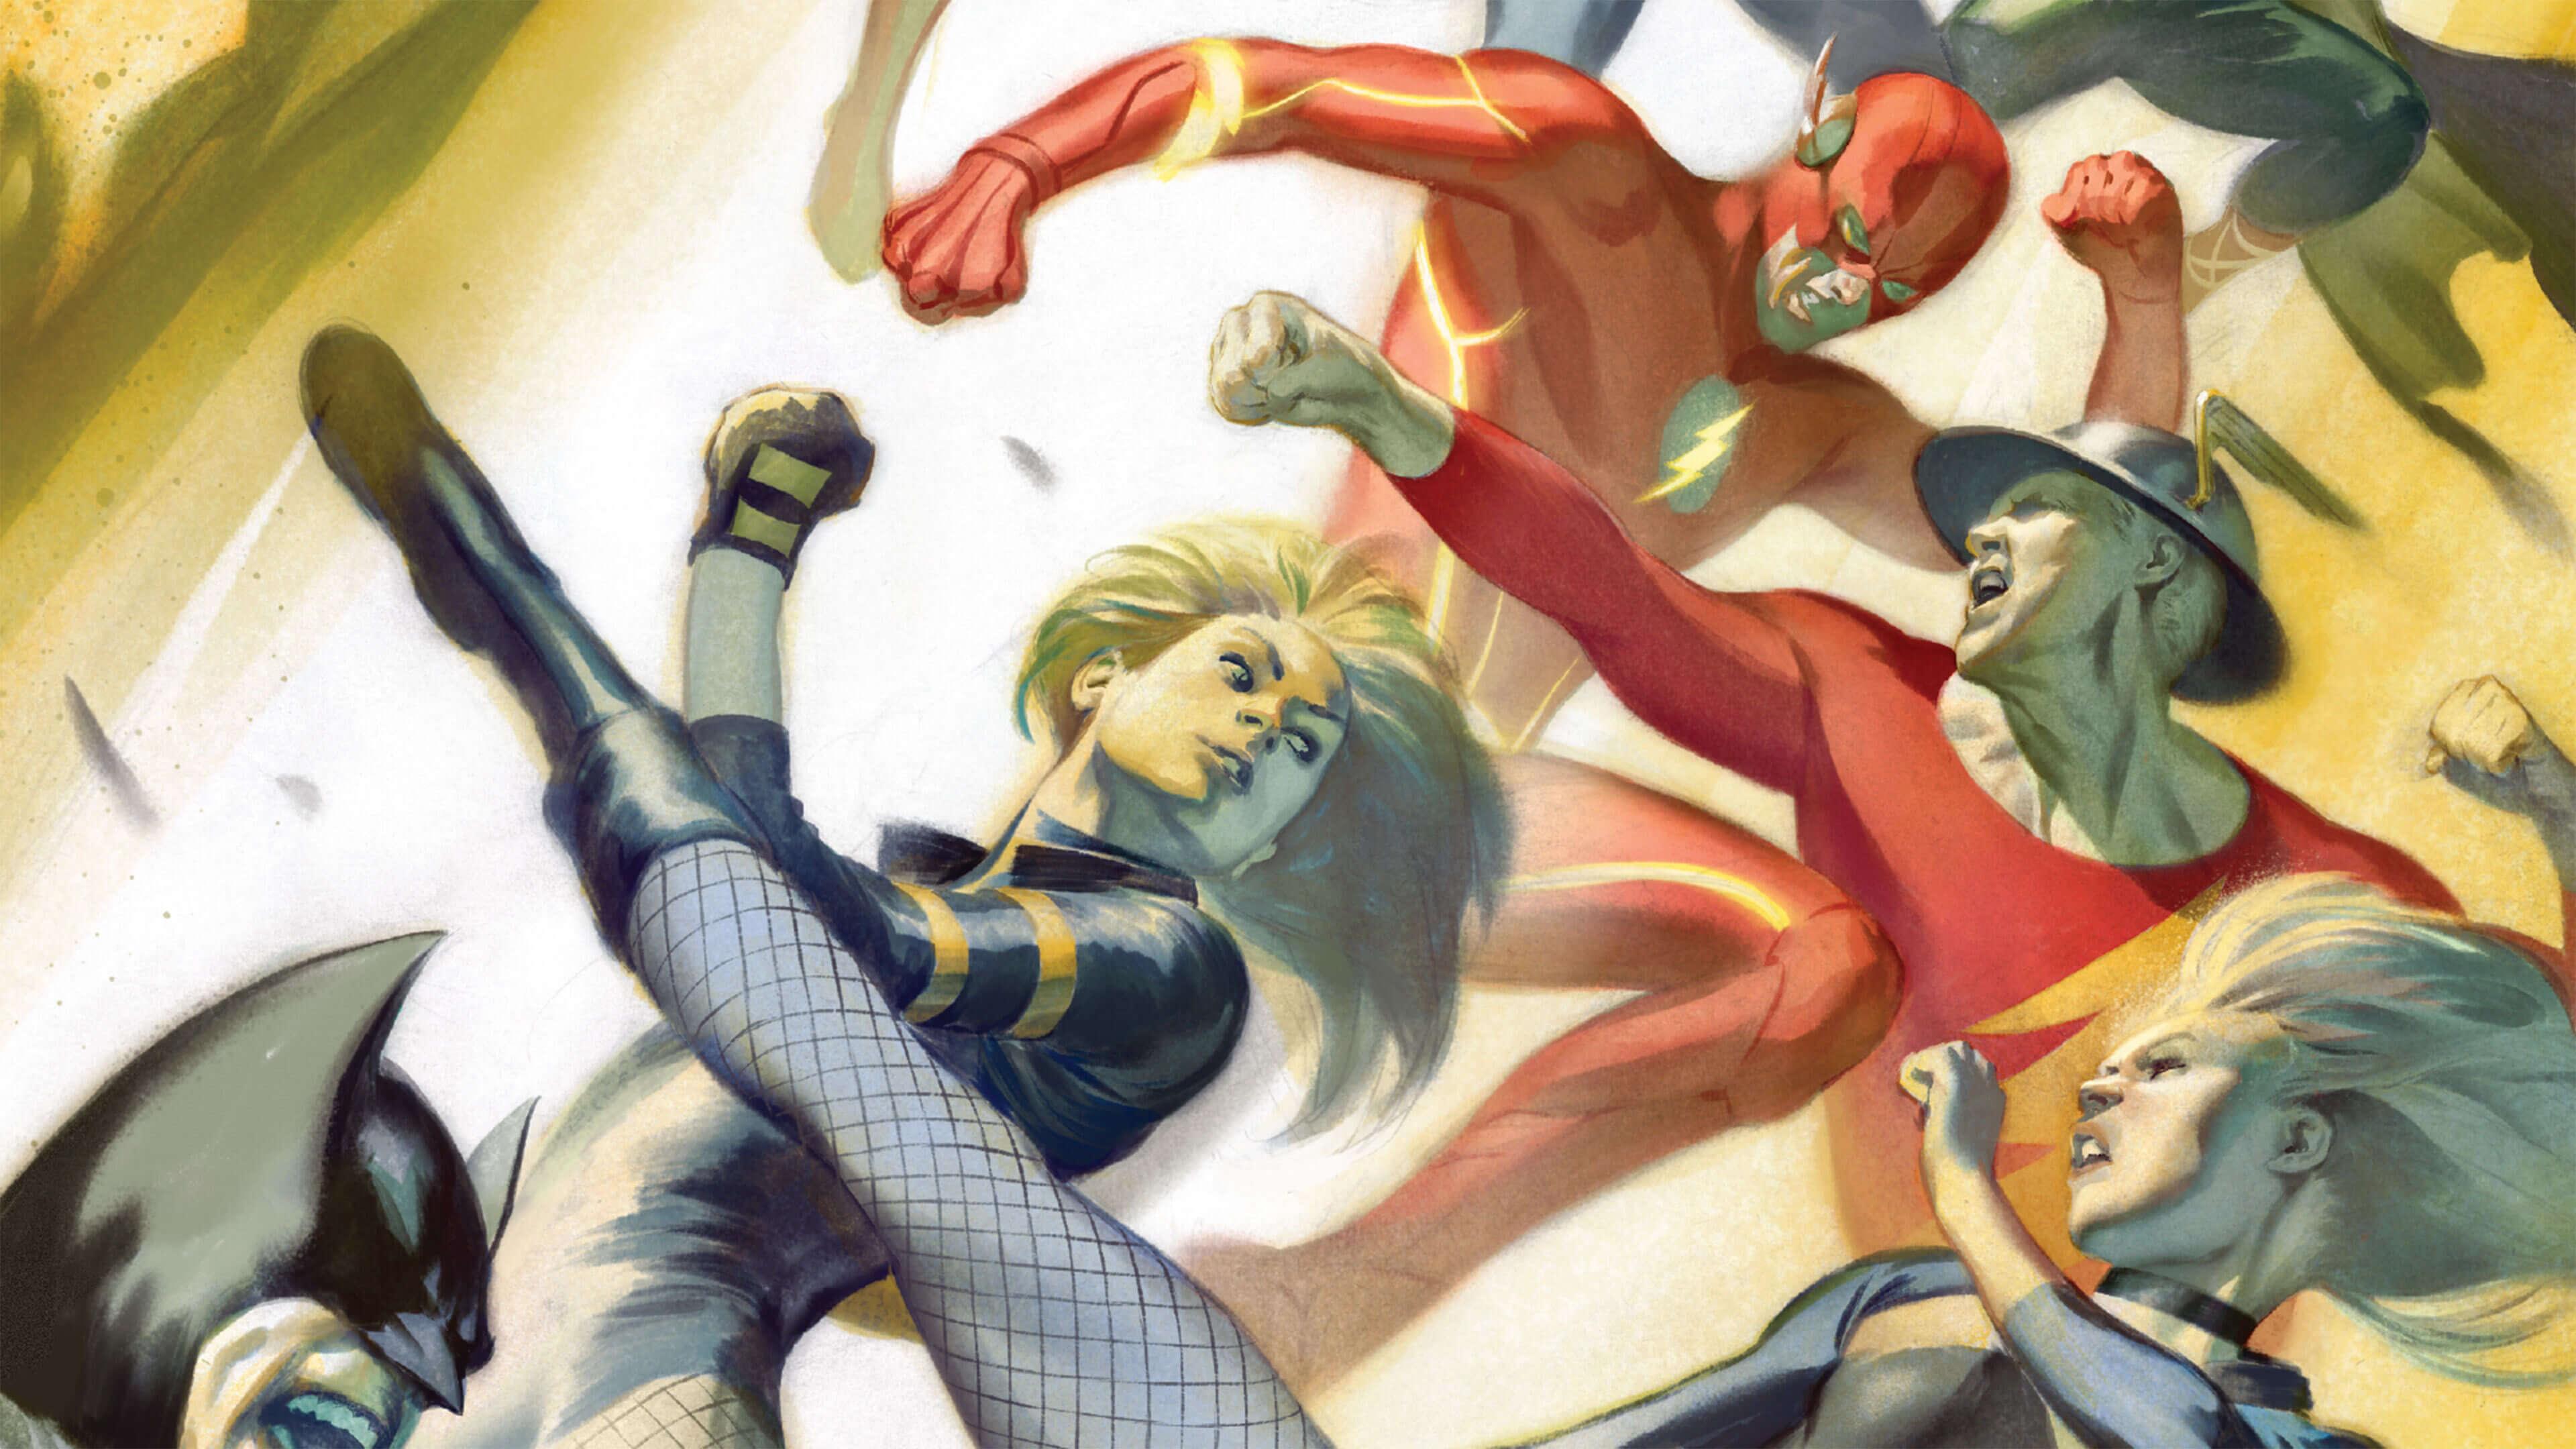 injustice_yearzero_customhero_hero-c_v1_201104-2.jpg